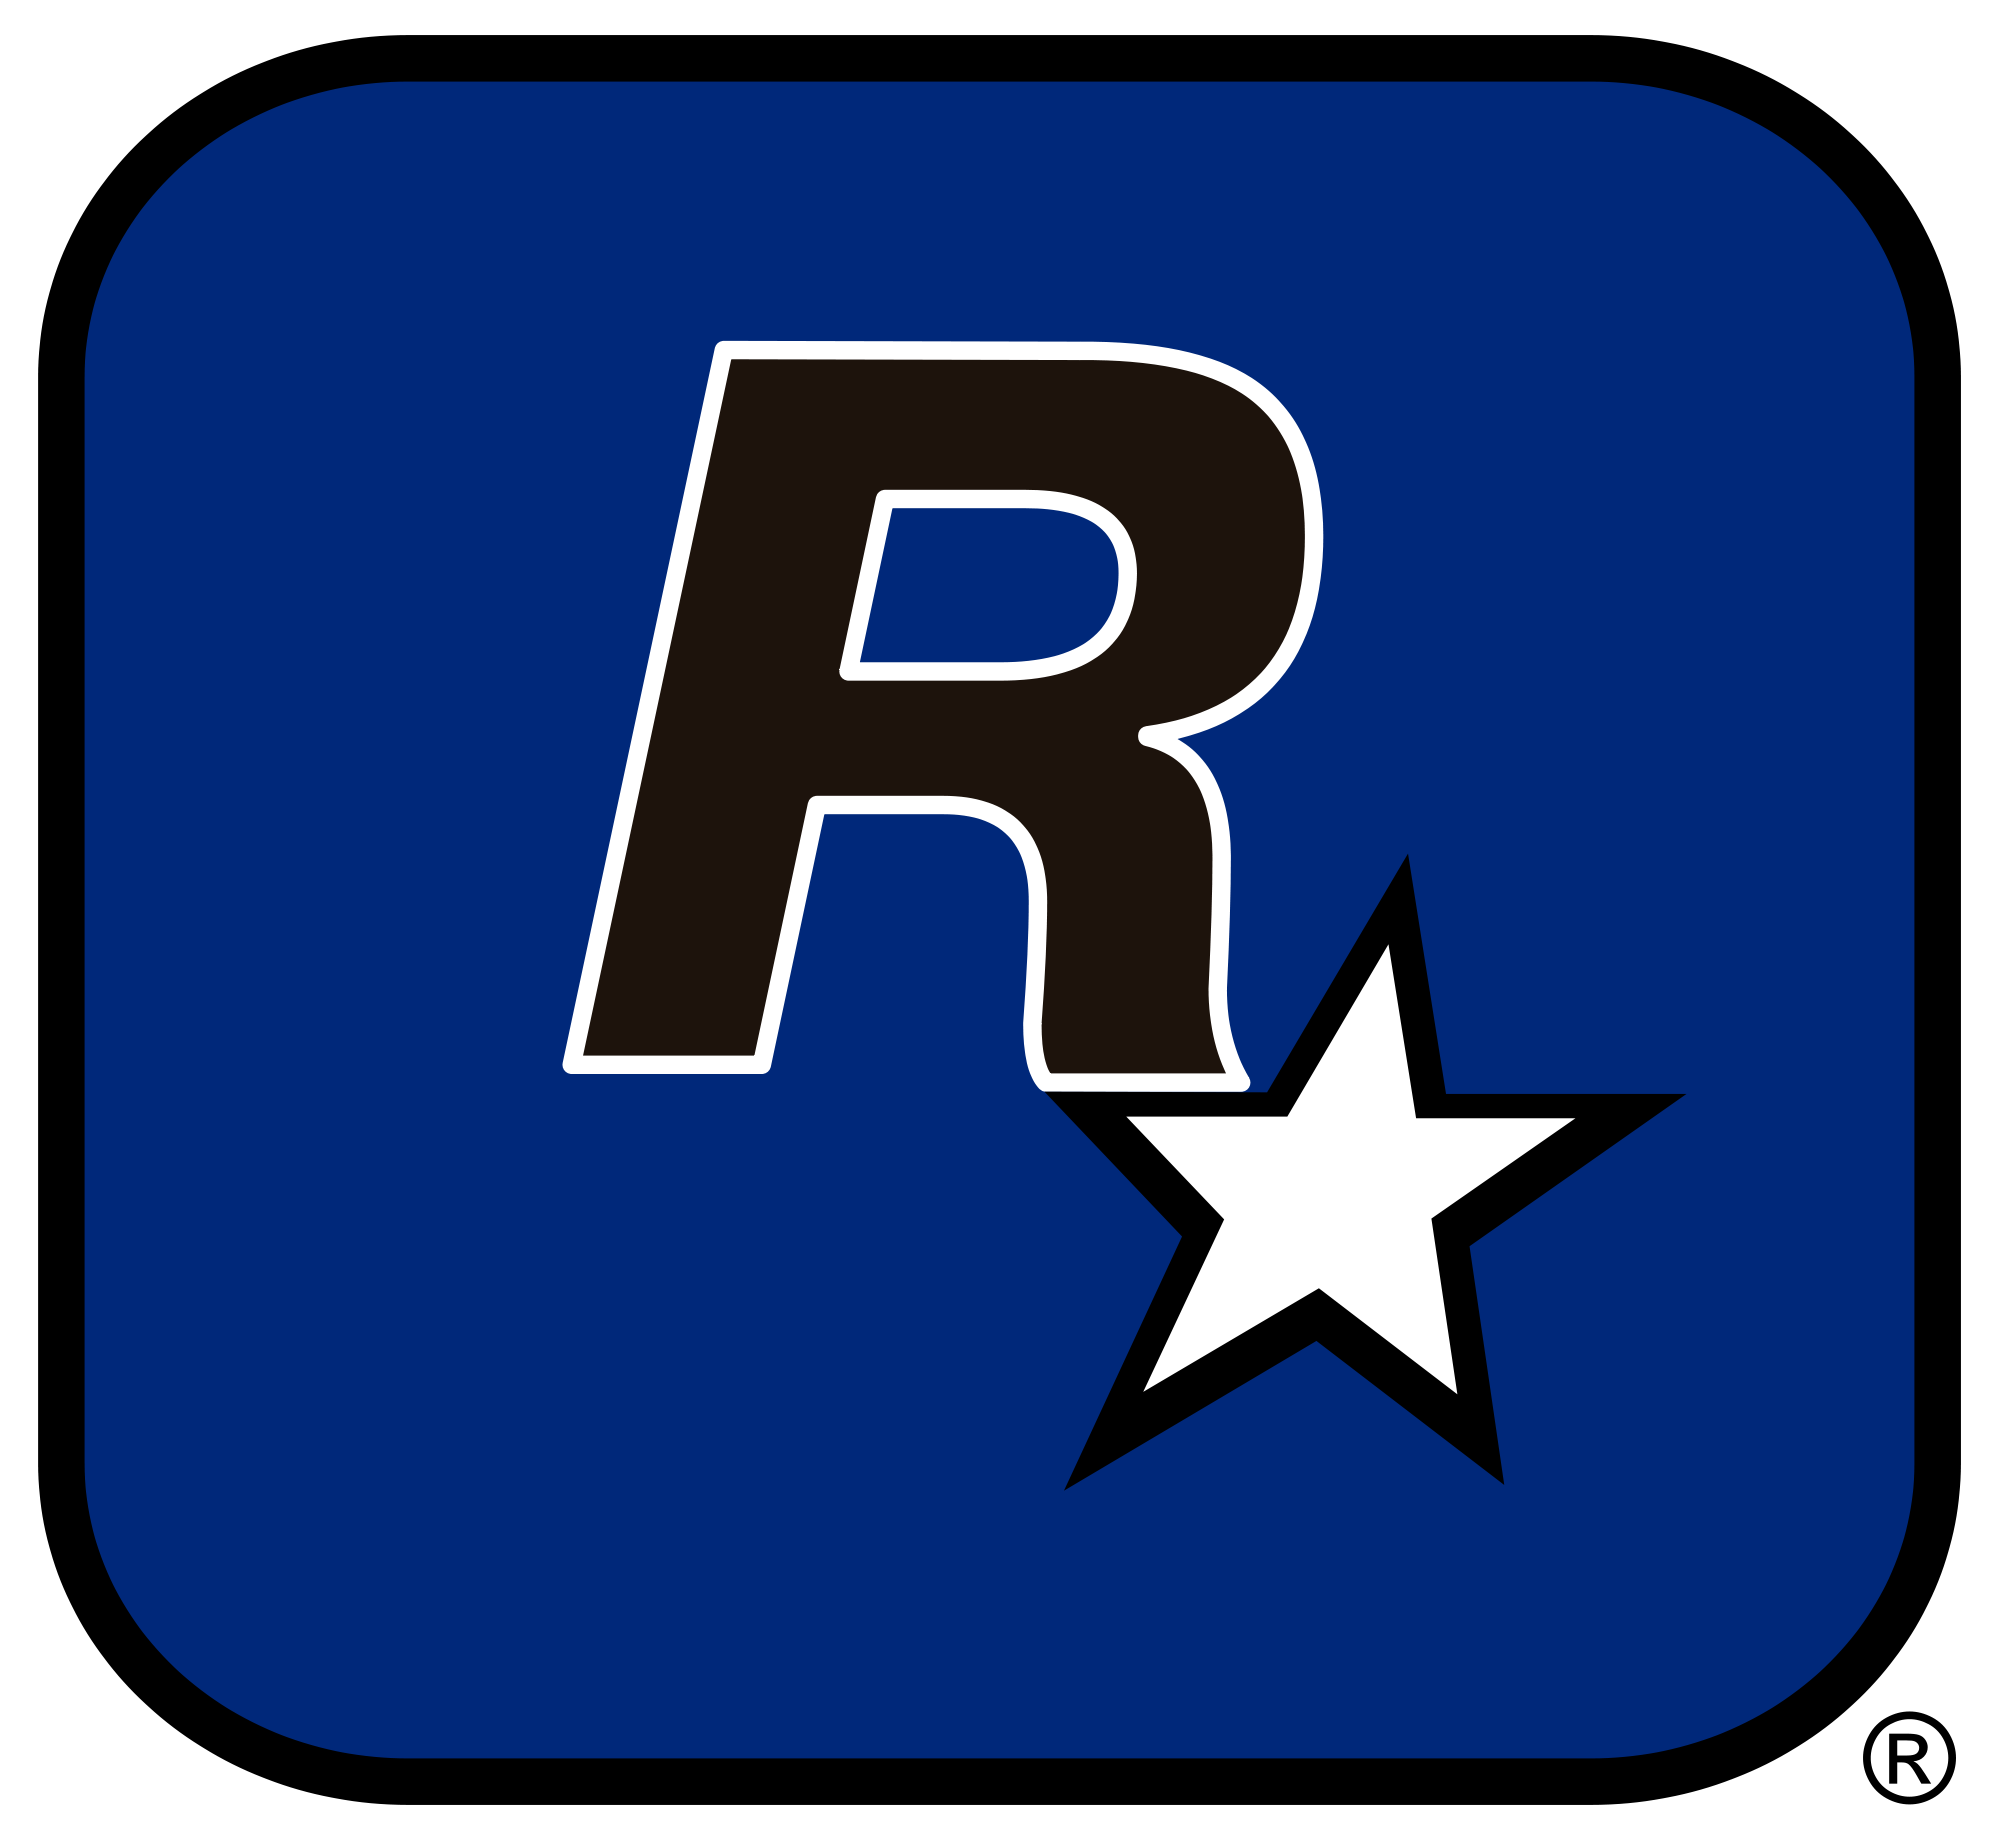 Image cj gtav transparent png gta wiki the grand theft auto wiki - Rockstar Games Rockstar Games Rockstar Games Gta Wiki The Grand Theft Auto